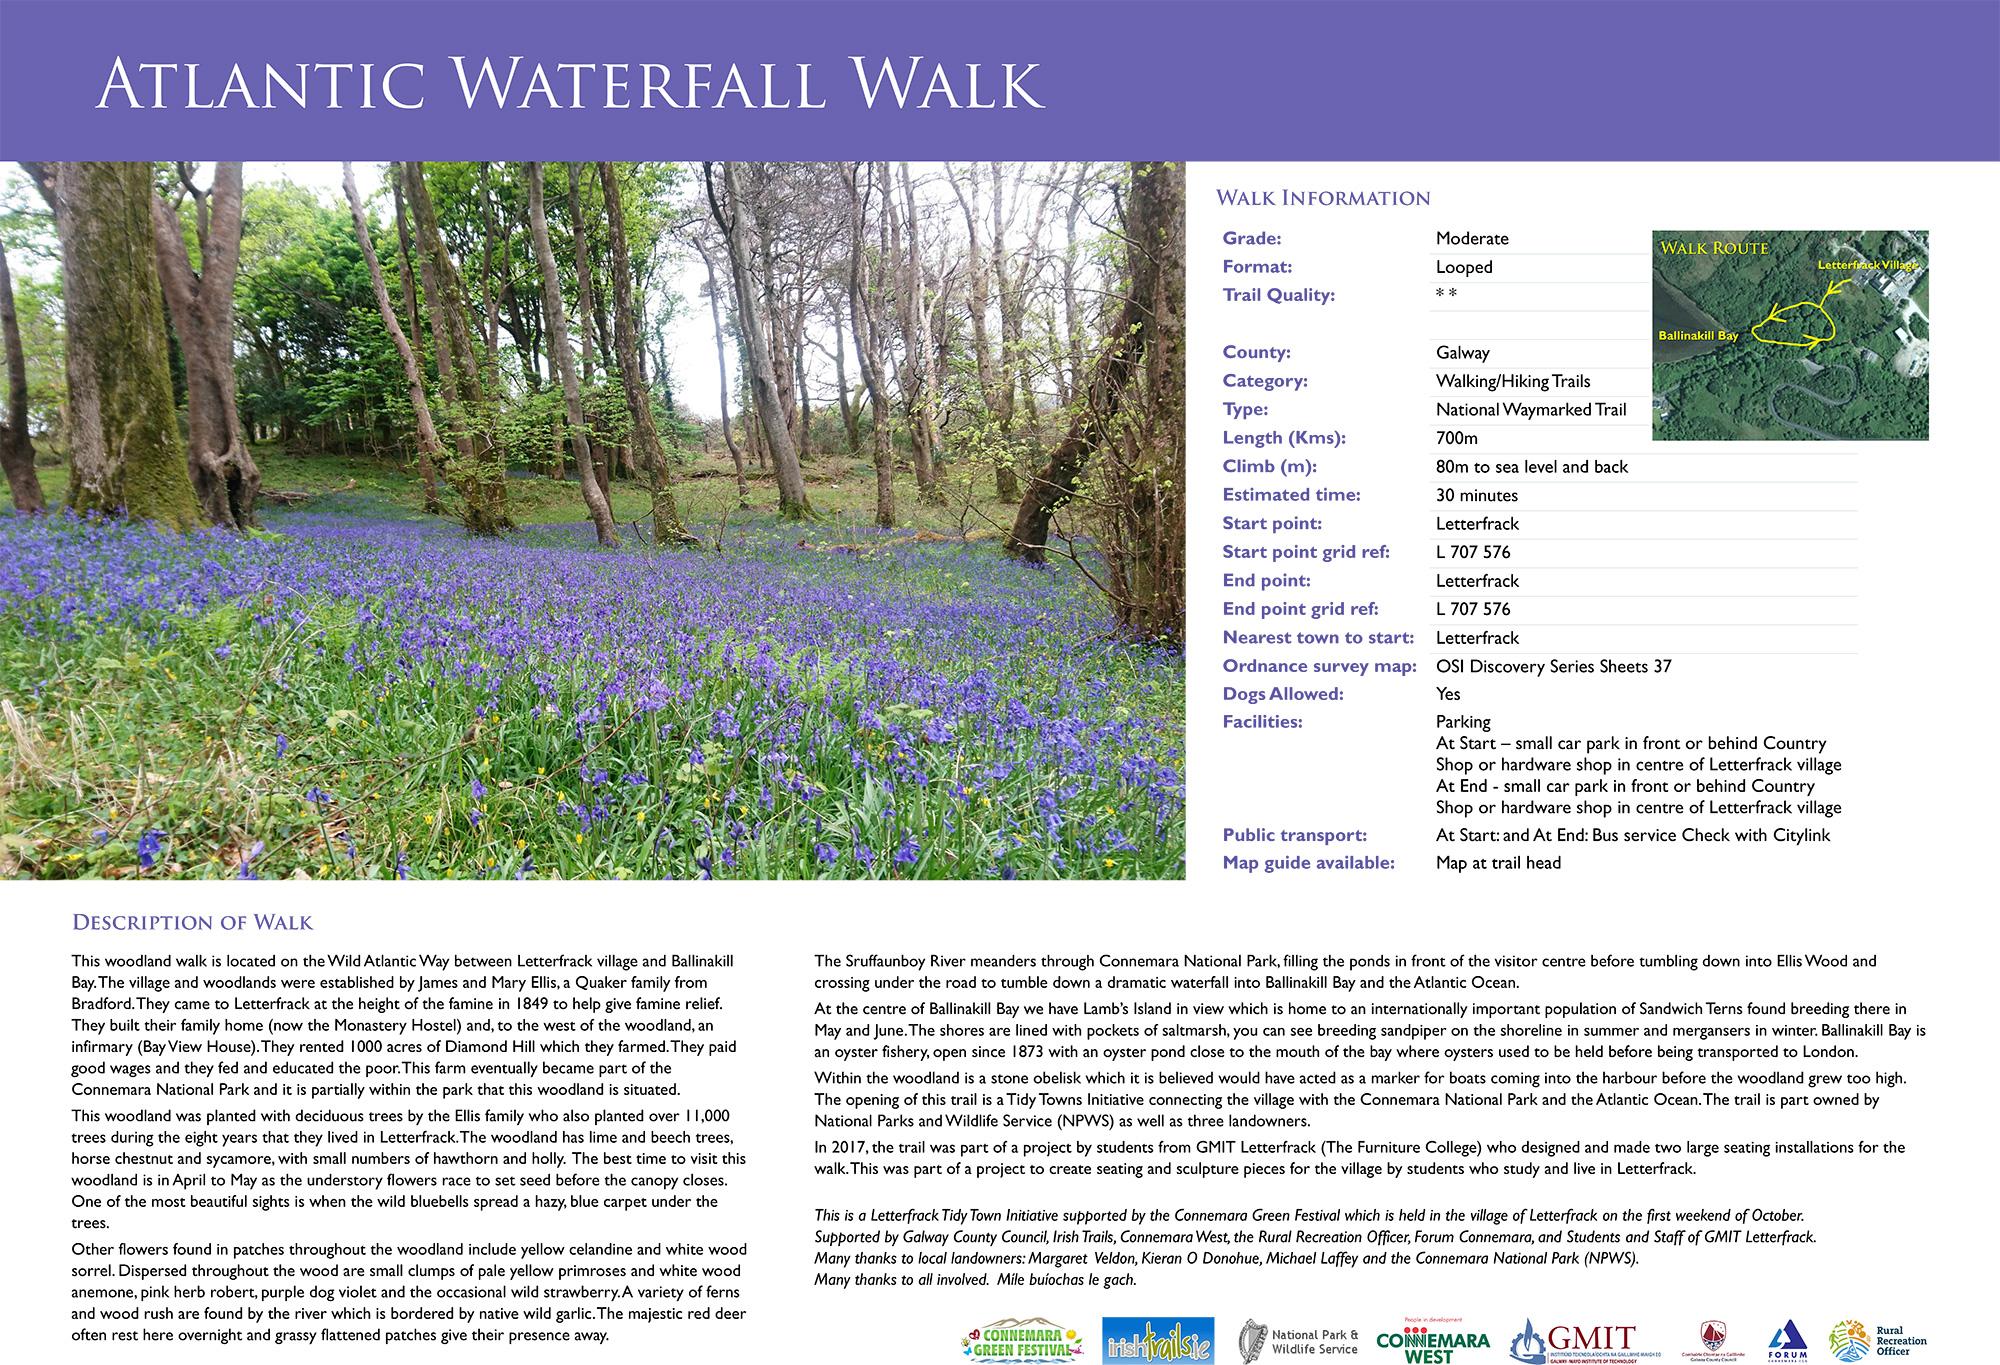 Atlantic Waterfall Walk, Letterfrack, Co. Galway